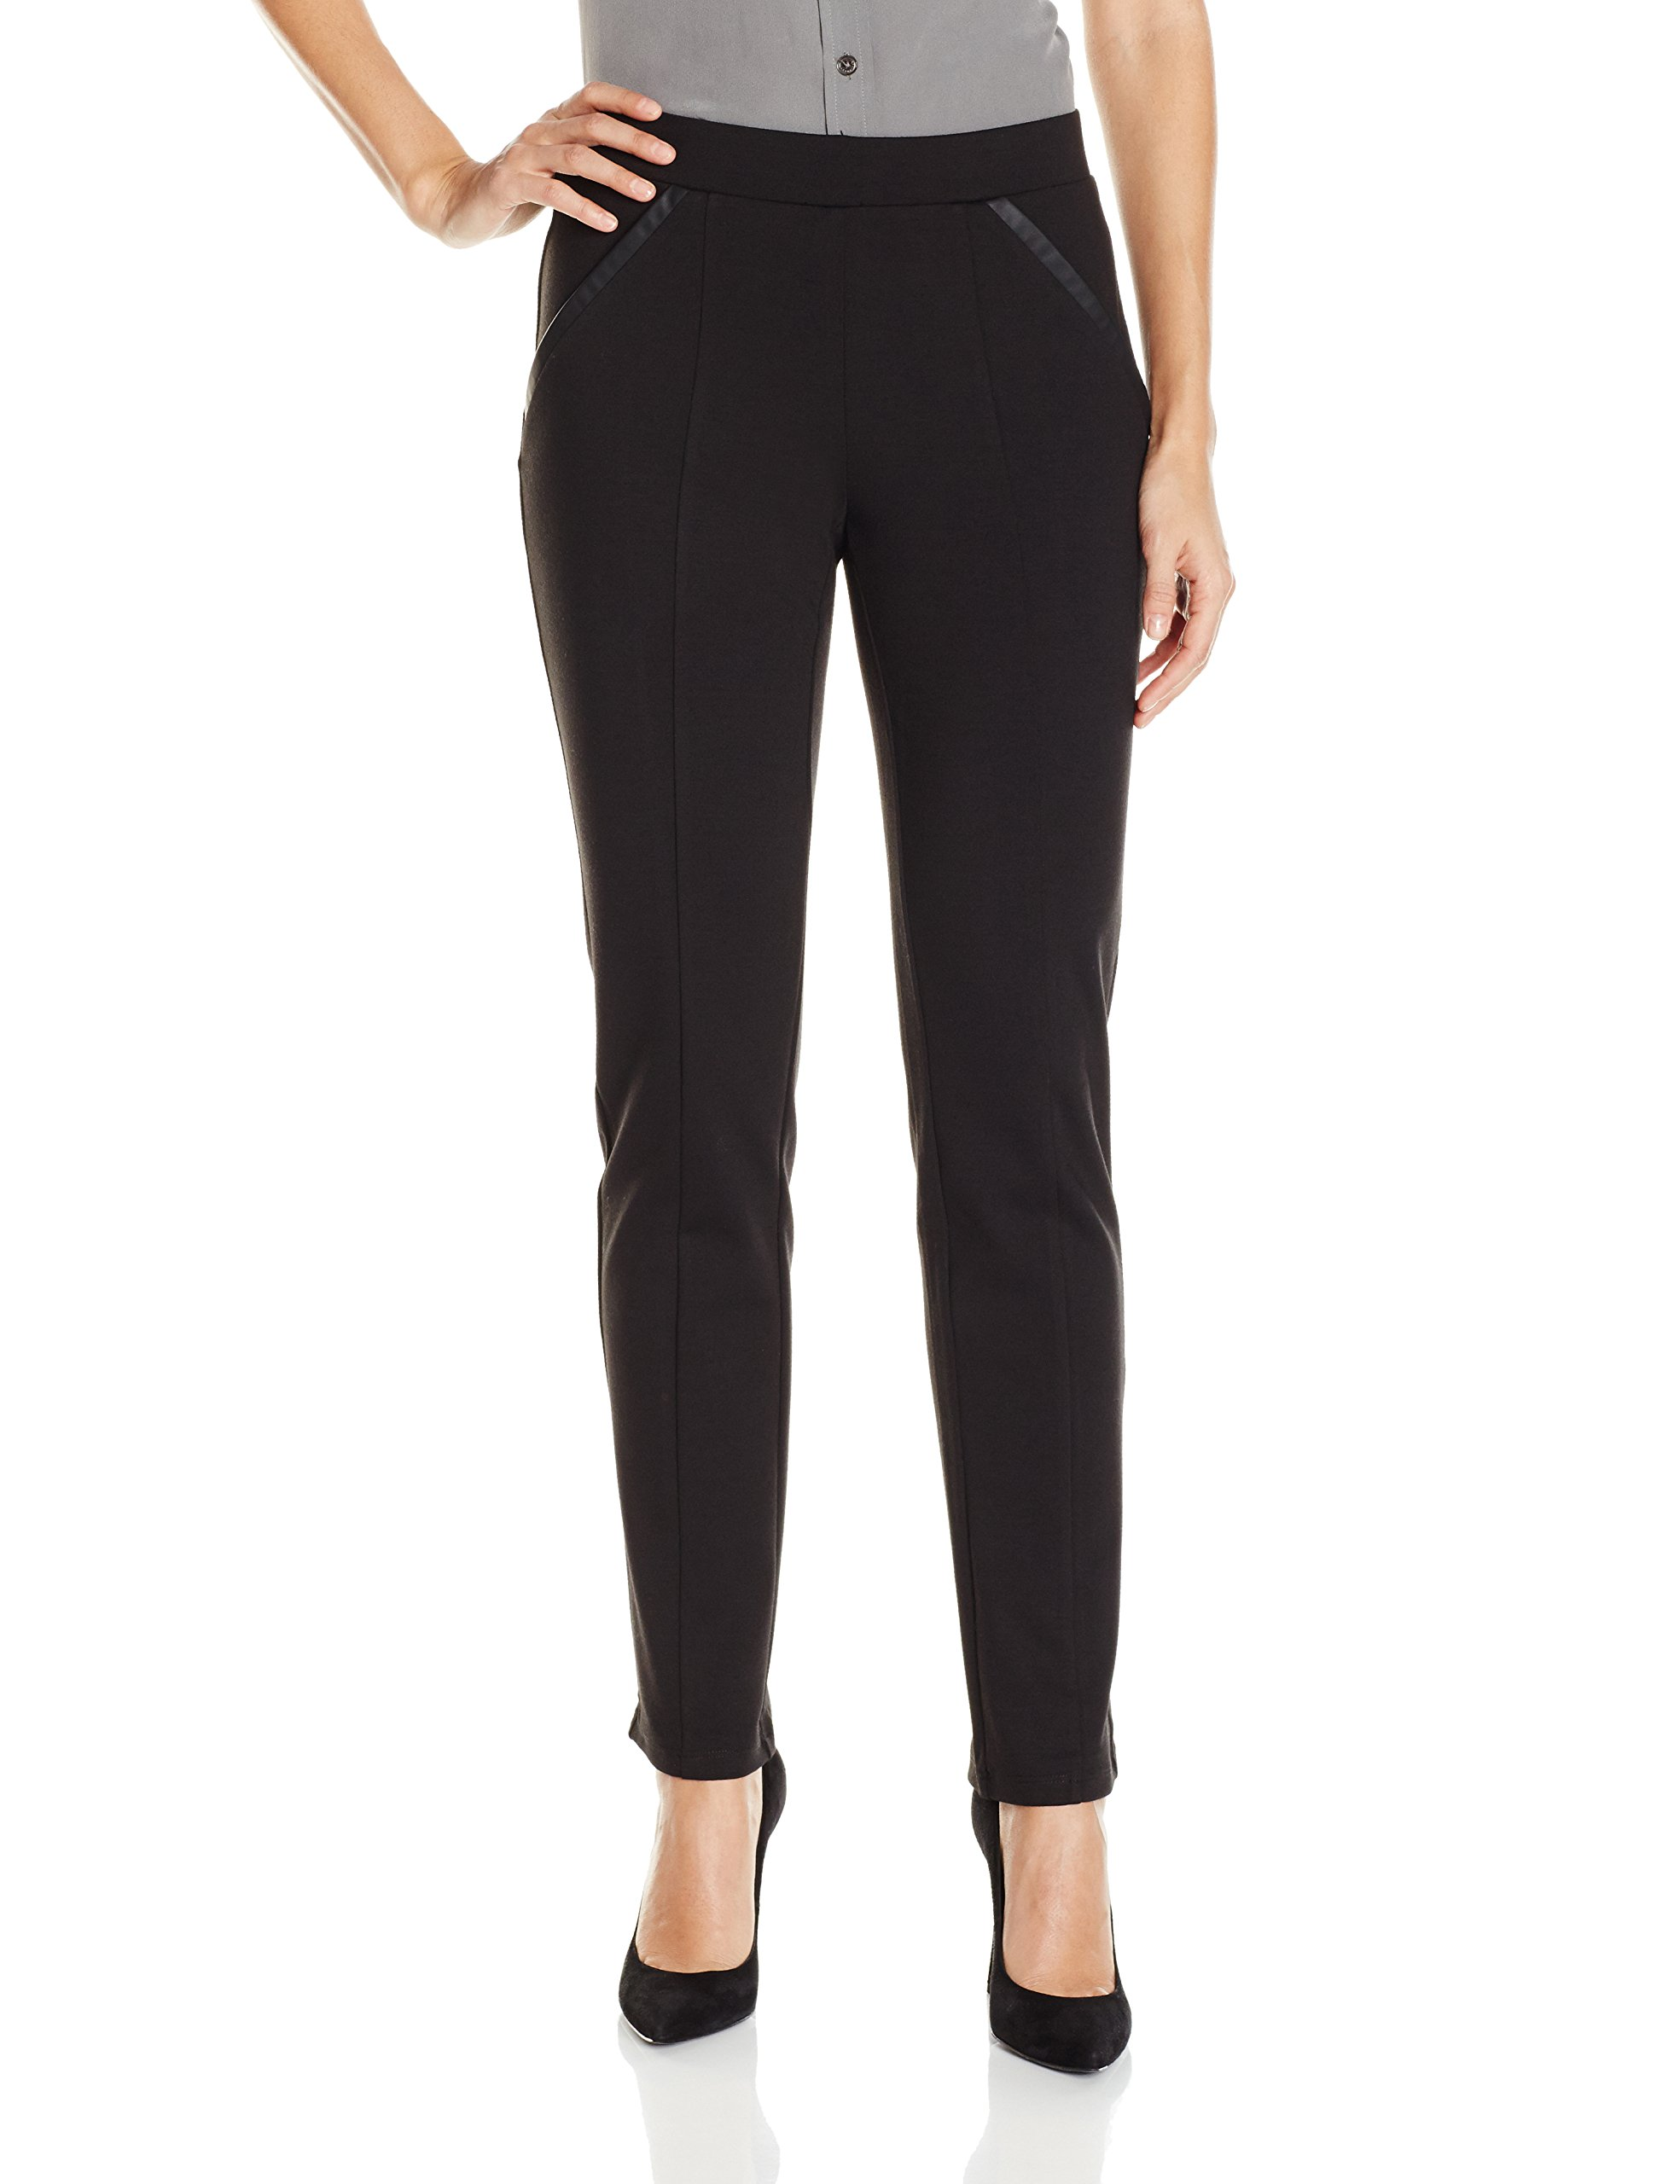 Rafaella Women's Ponte Comfort Fit Slim Leg Pants, Black, 8 by Rafaella